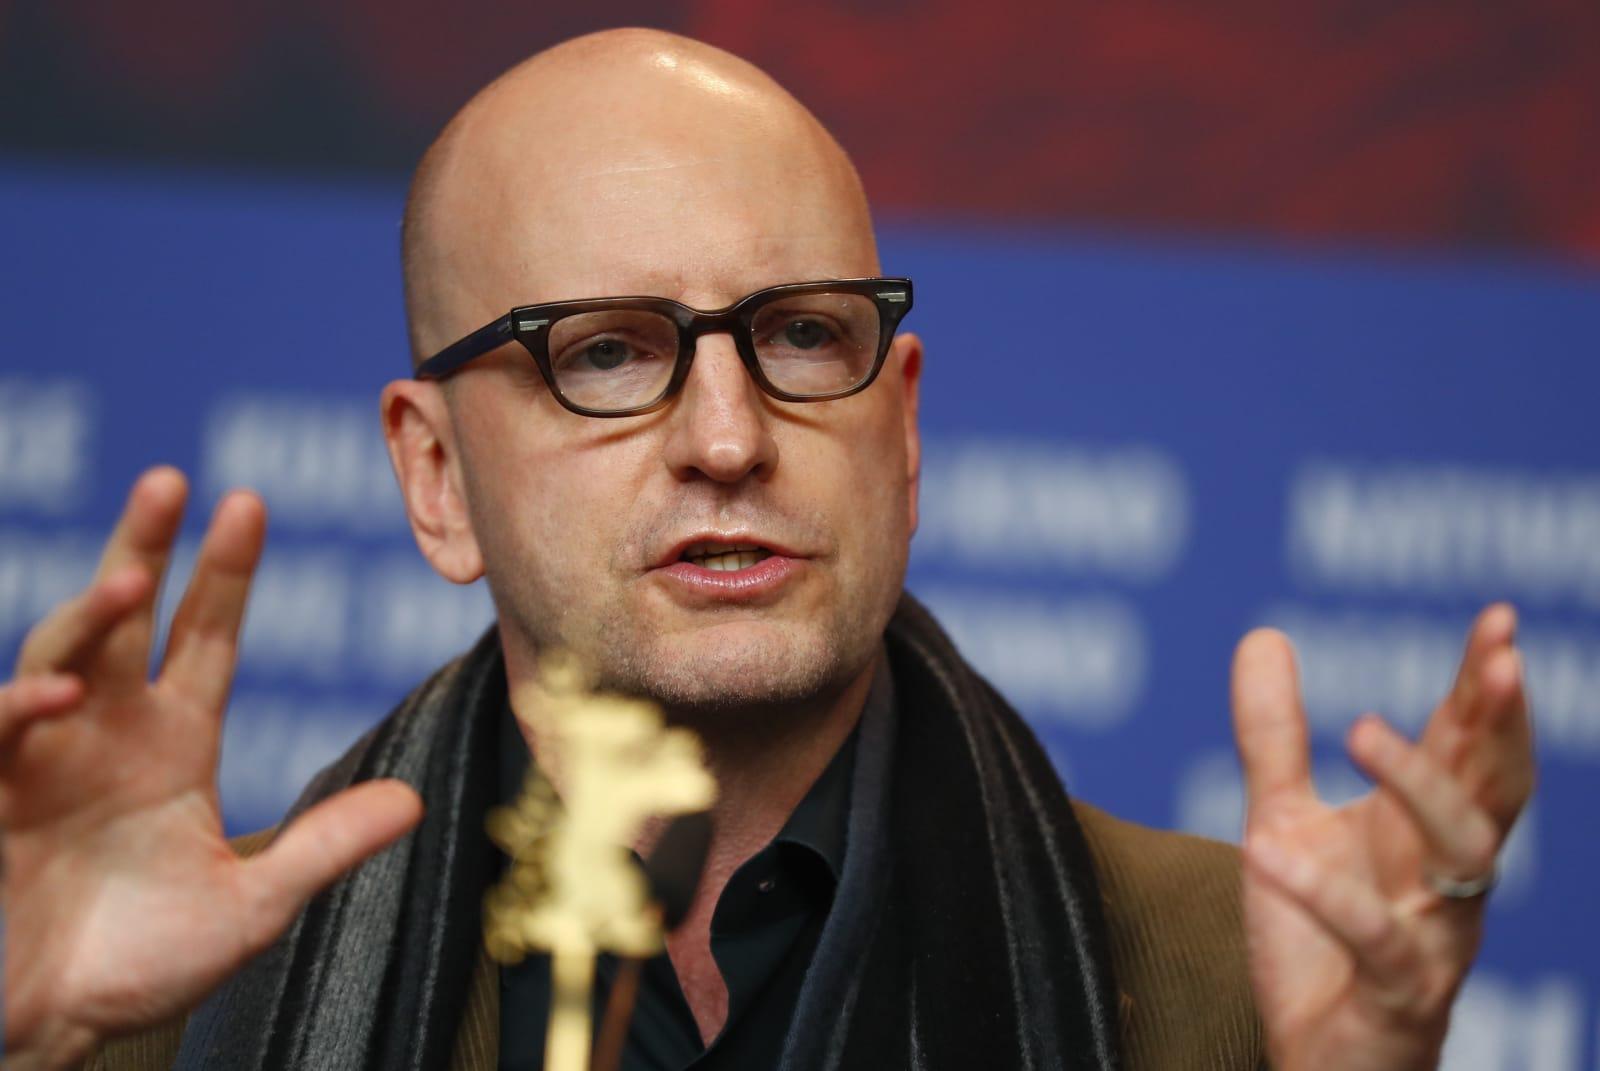 HBO Max snaps up Steven Soderbergh's latest Meryl Streep movie